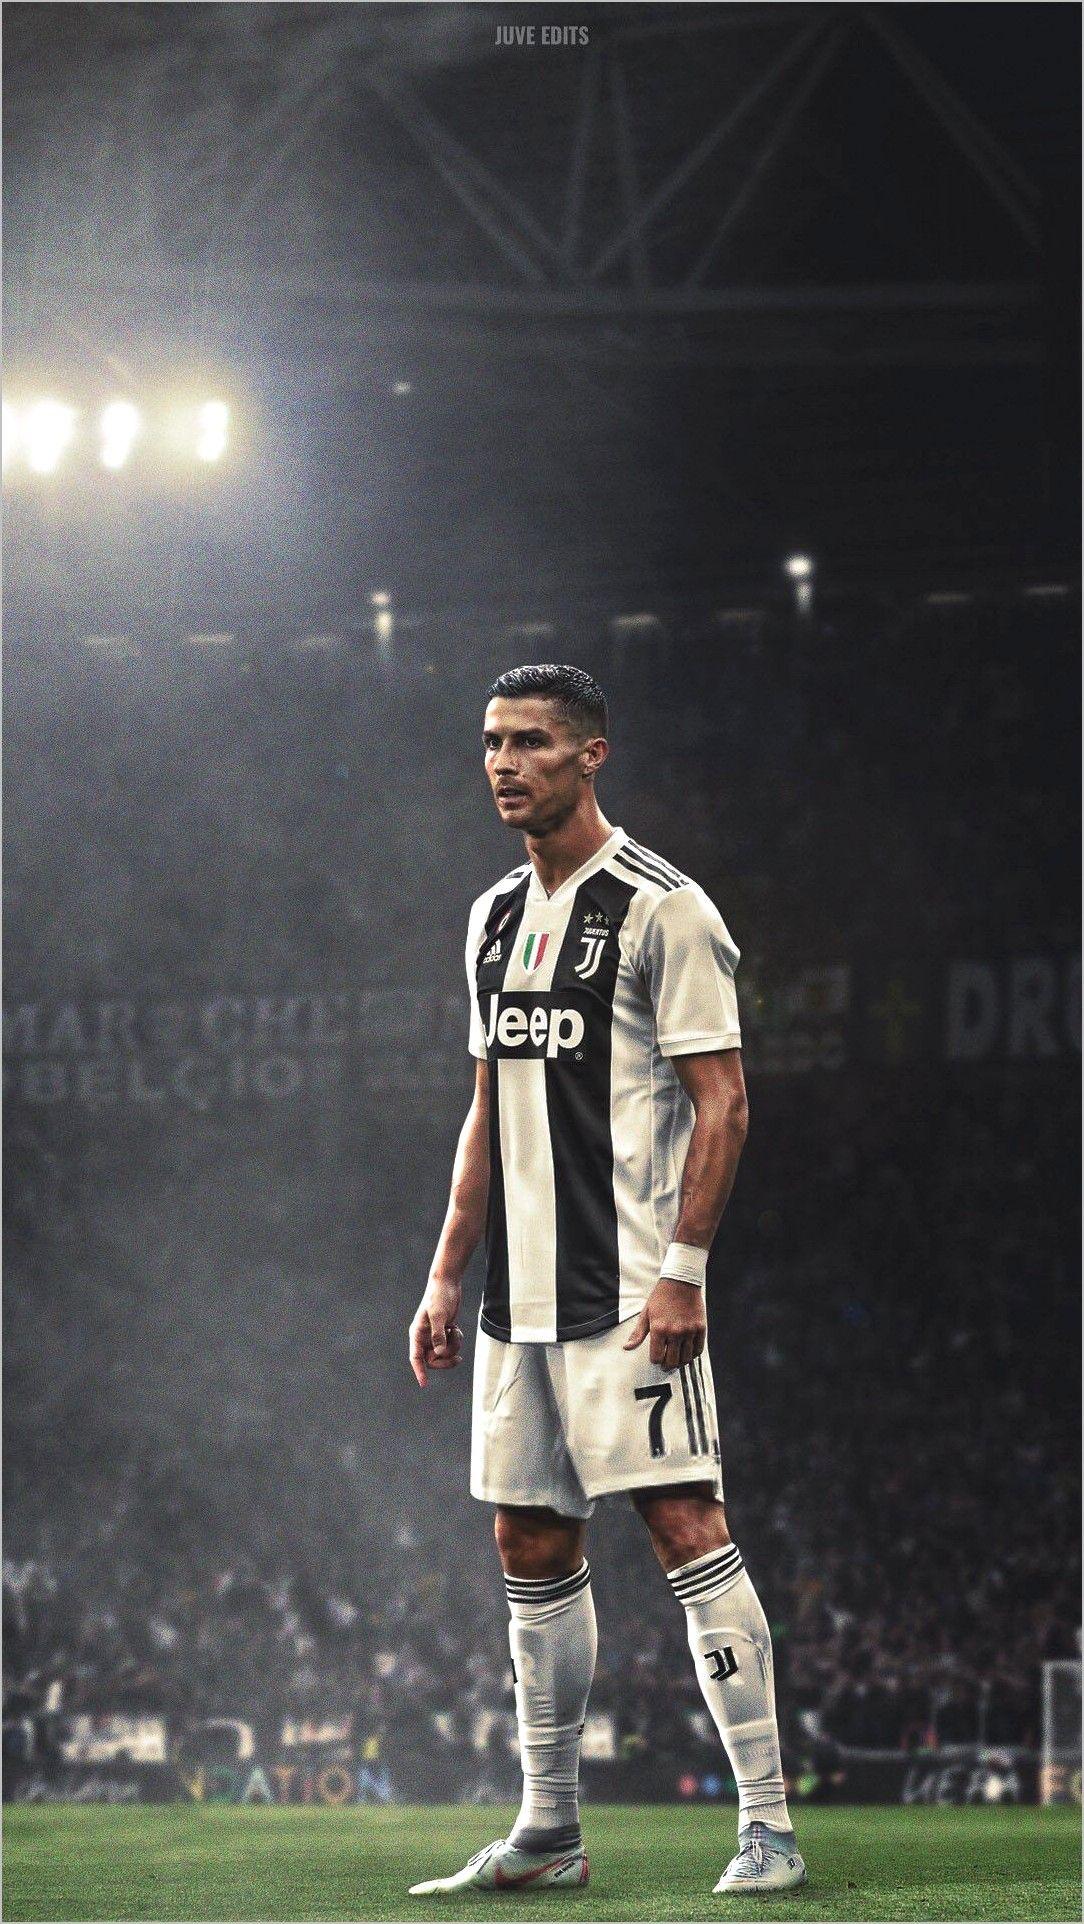 Cr7 Wallpaper Juventus 4k Cristiano Ronaldo Cristiano Ronaldo Juventus Ronaldo Juventus